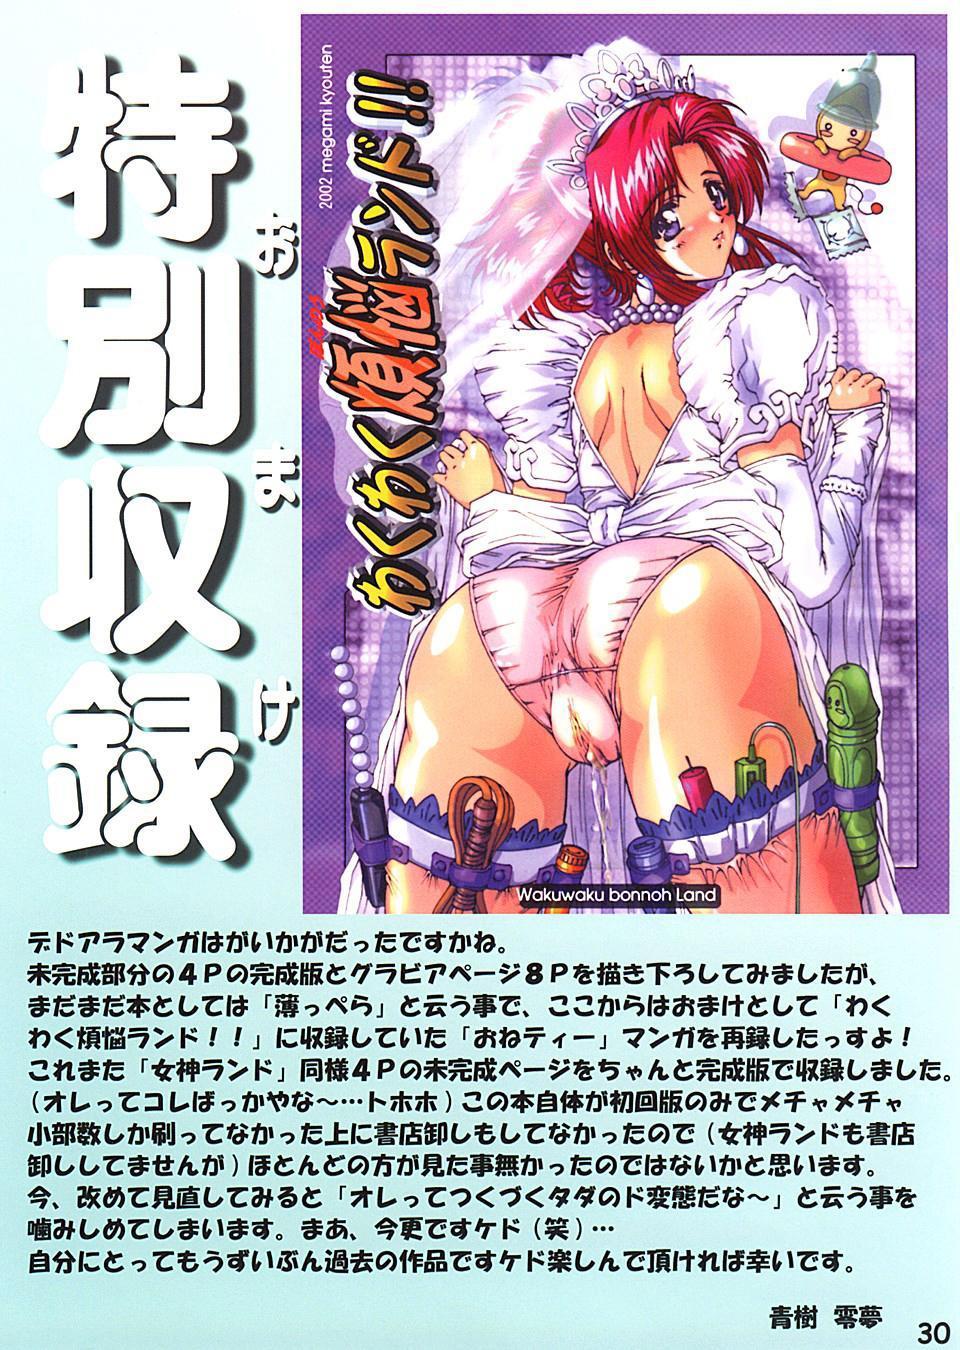 Dead or Alive - Waku Waku Venus Land Ver.2 27